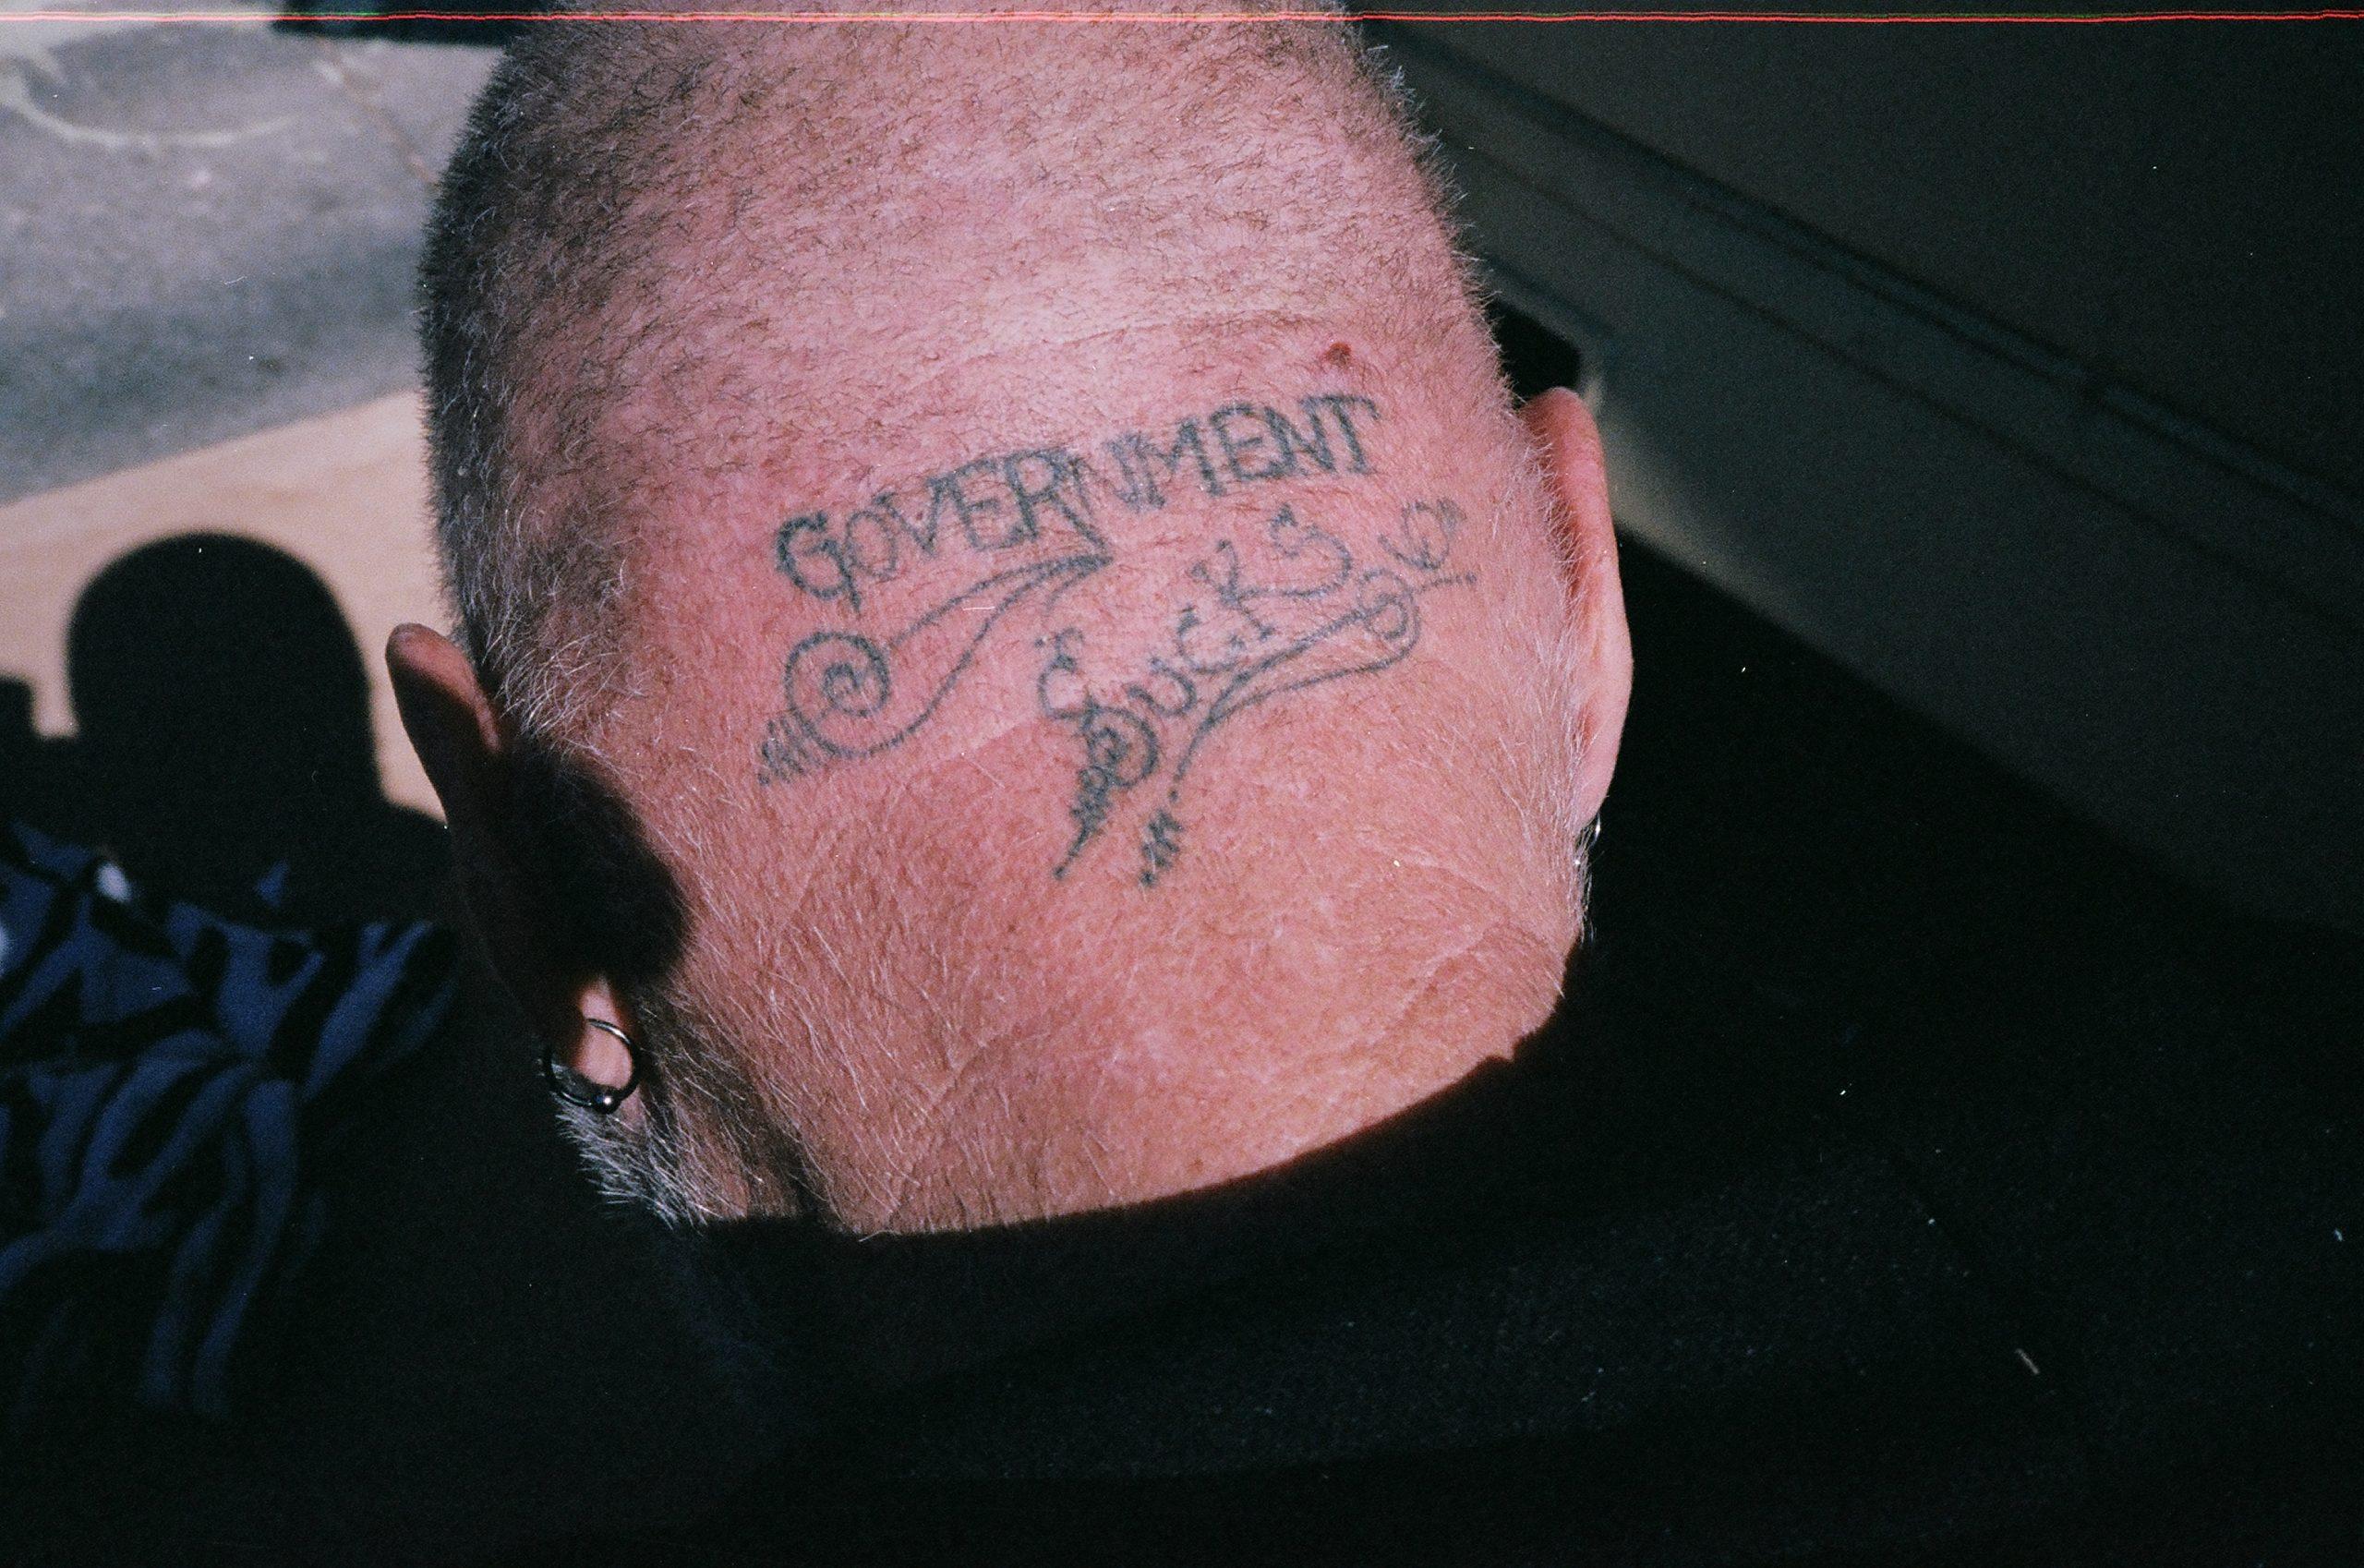 The back of a homeless man's head. Government Sucks. Berkeley, 2014